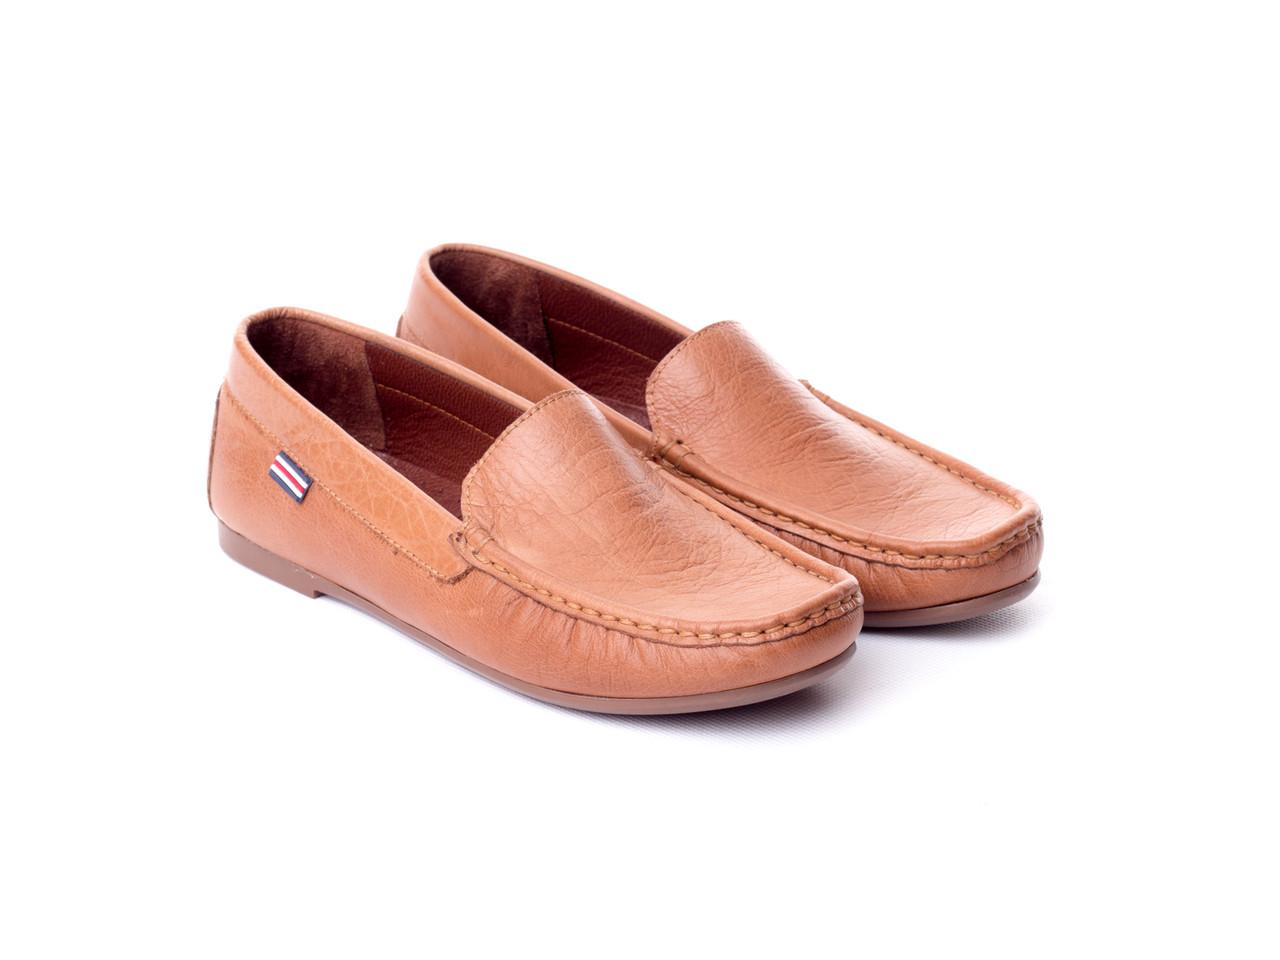 Мокасины Etor 2755-7027-2 38 коричневые